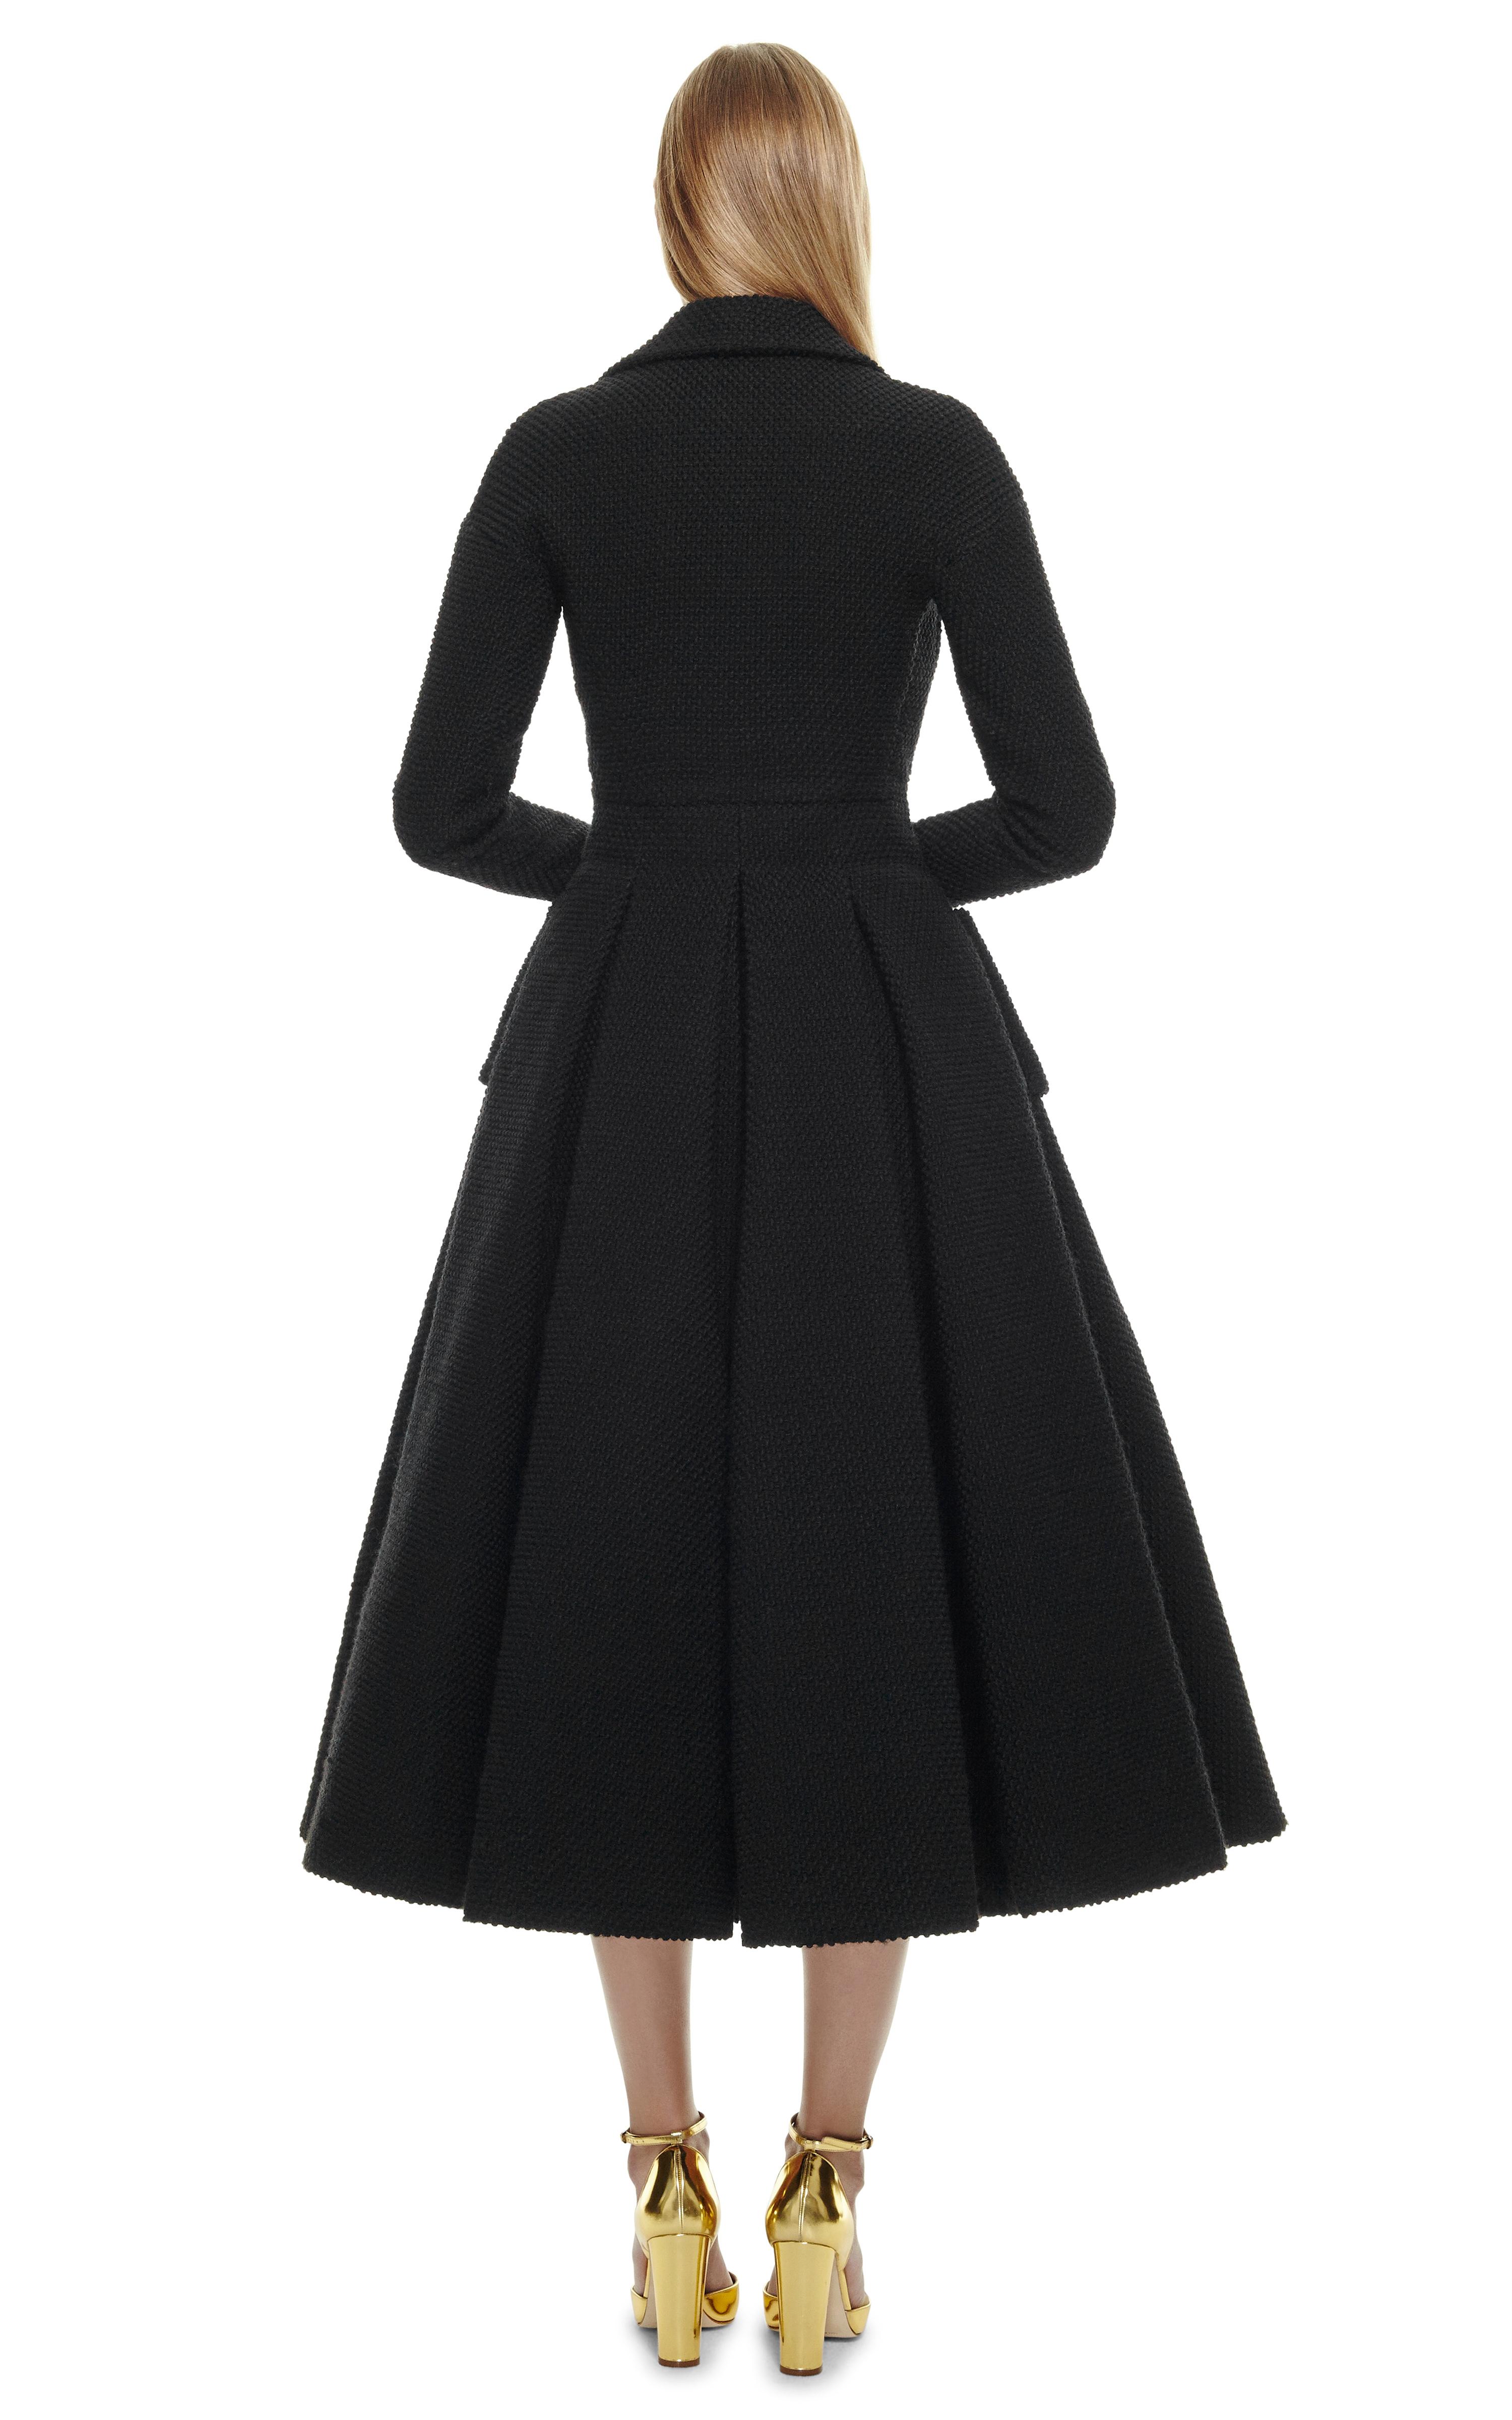 Emilia Wickstead C Coat Dress With Tuille Fusing In Black